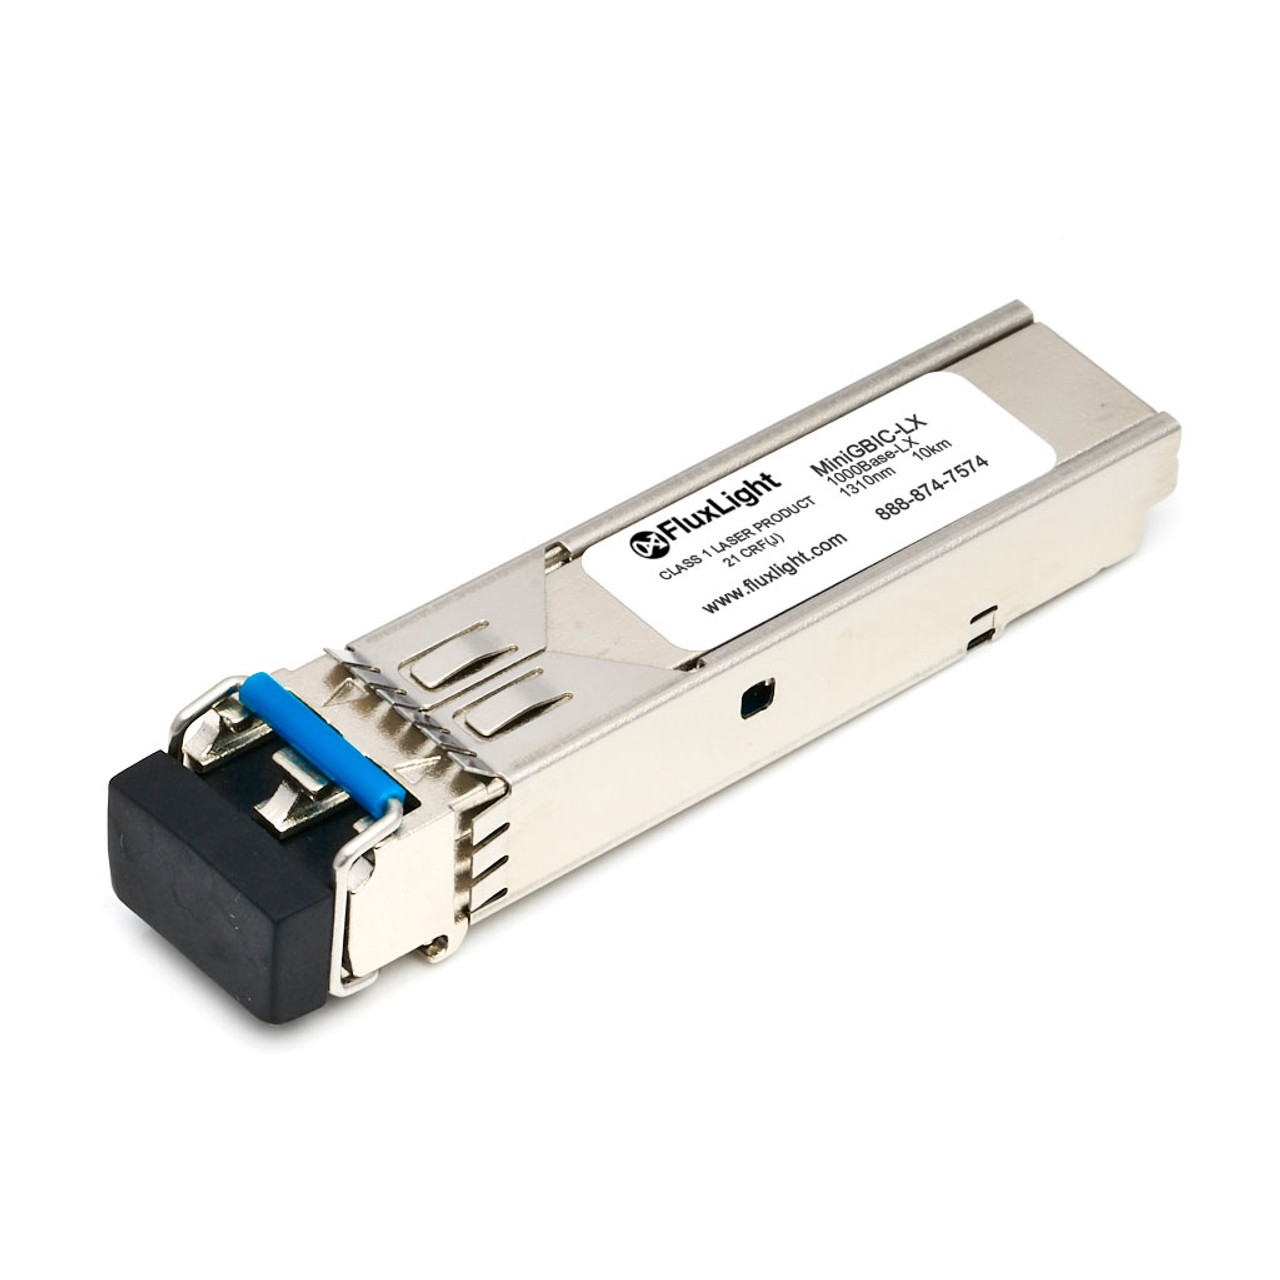 Juniper NS-SYS-GBIC-MLX Mini-GBIC LX Transceiver SFP-LX 1310nm SMF